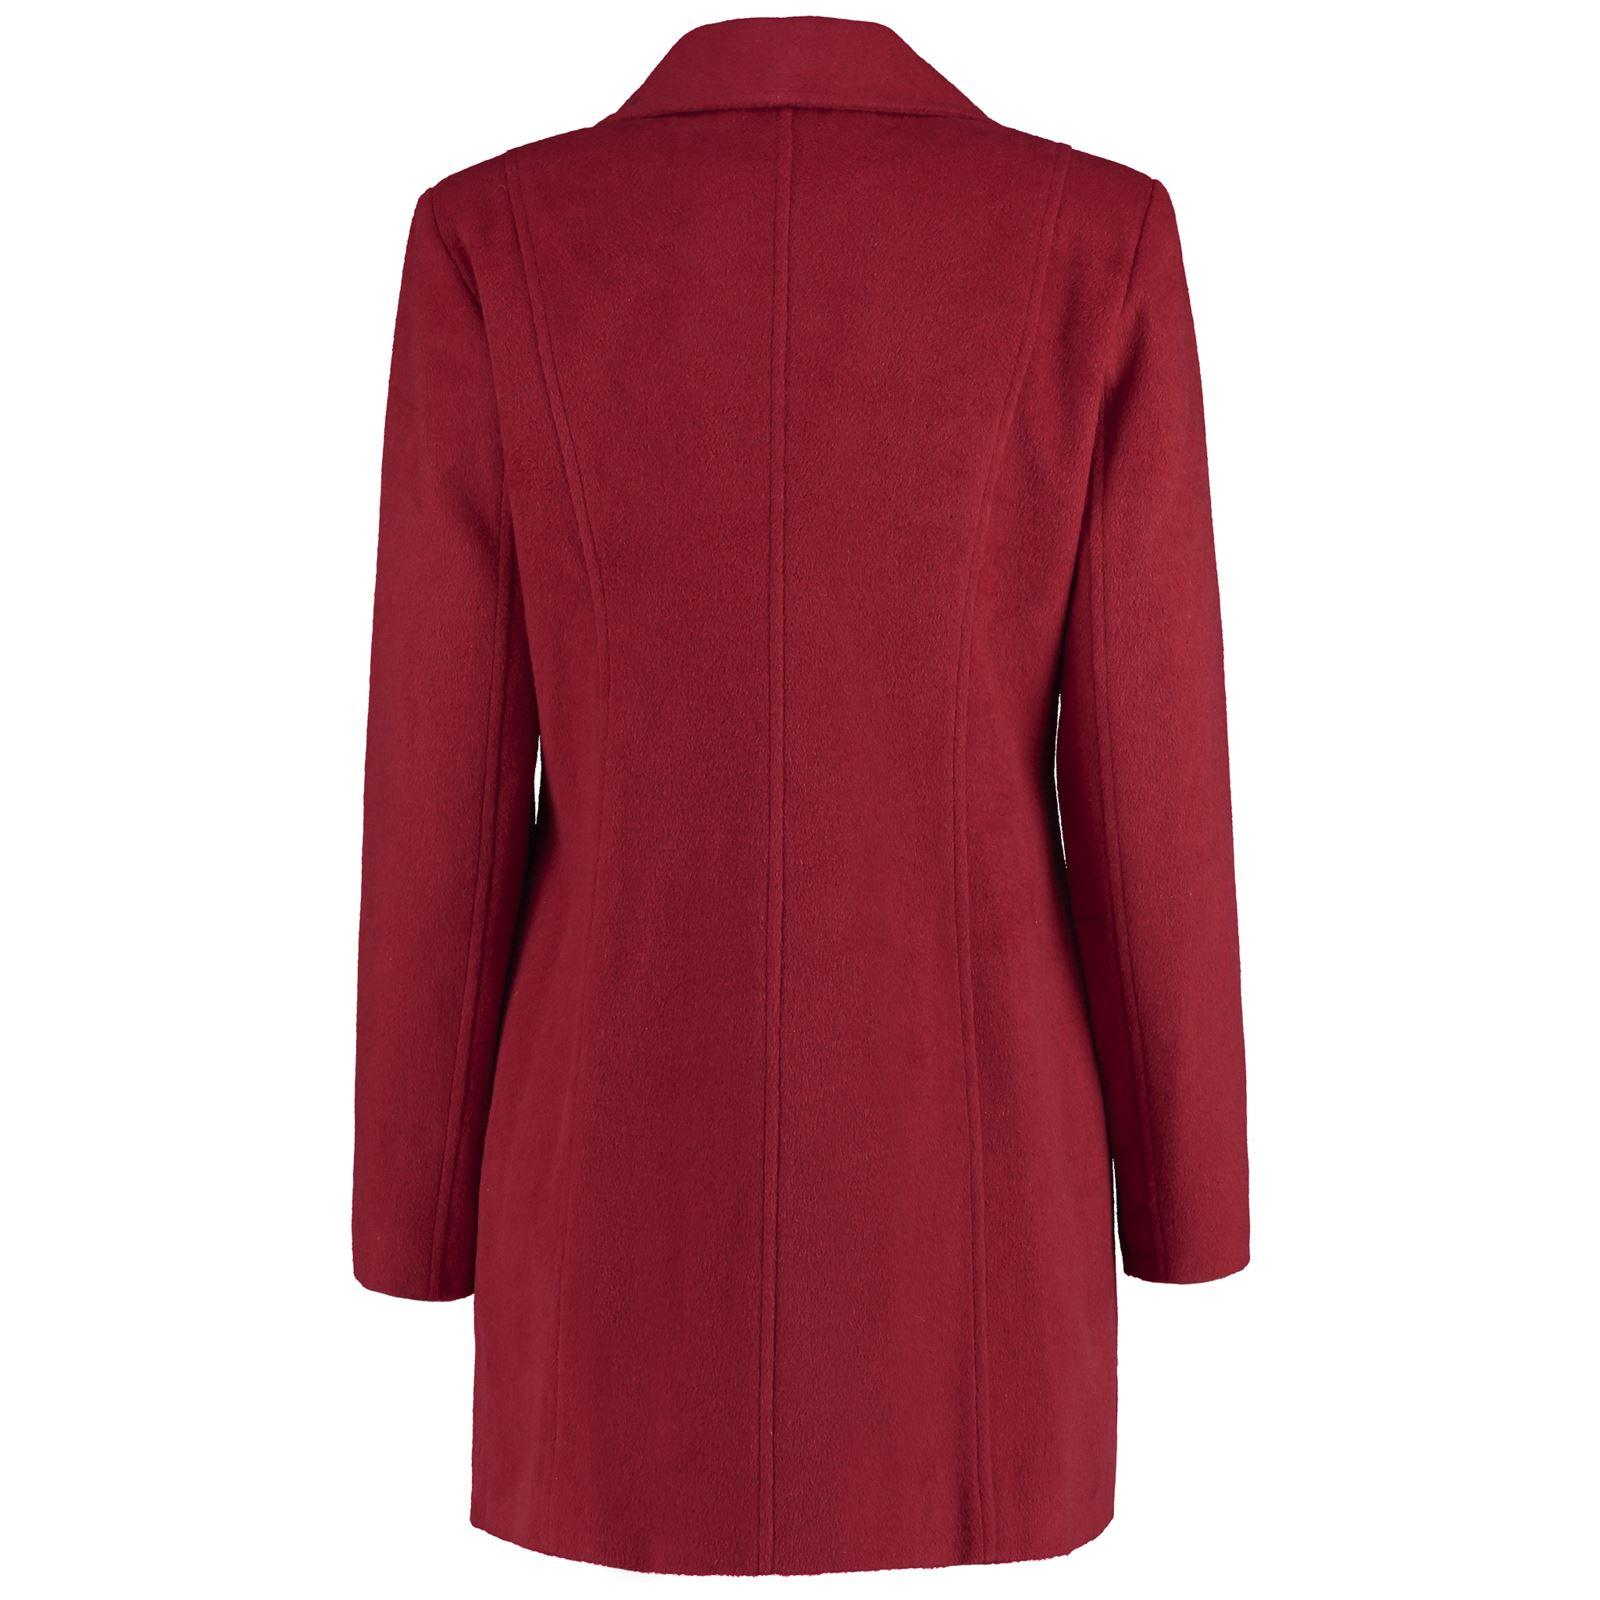 De La Creme - Women's Mohair Blend Winter Coat | eBay